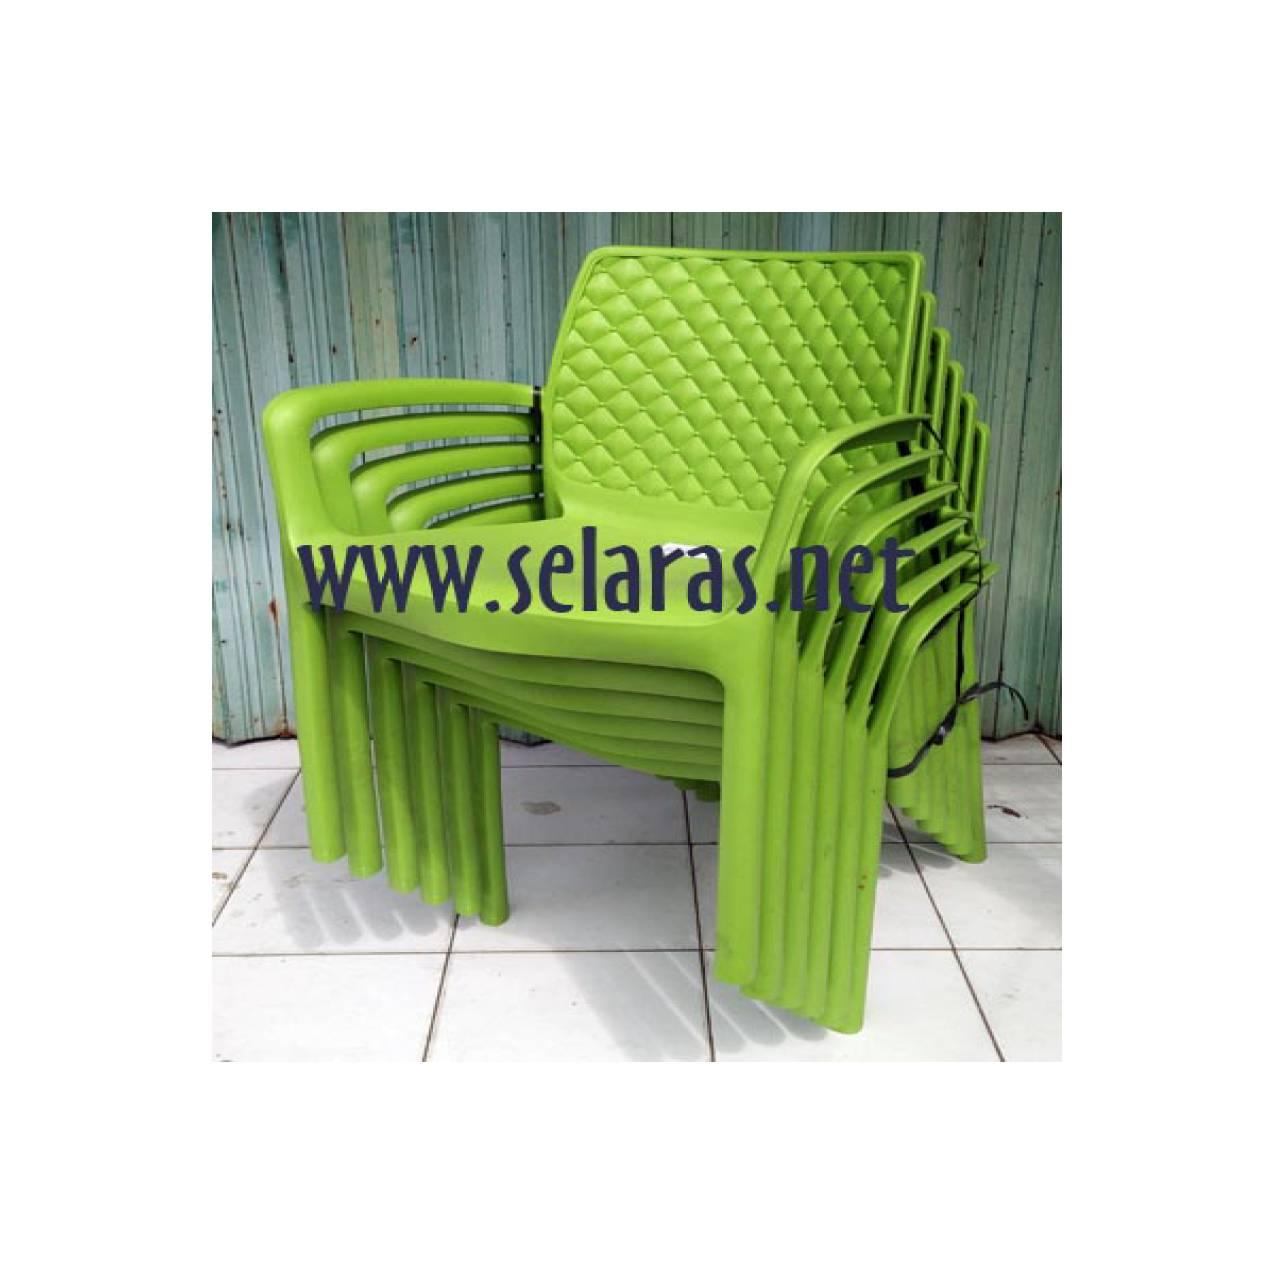 Olymplast Kursi teras/ kursi taman/ kursi cafe plastik wrn hijau daun